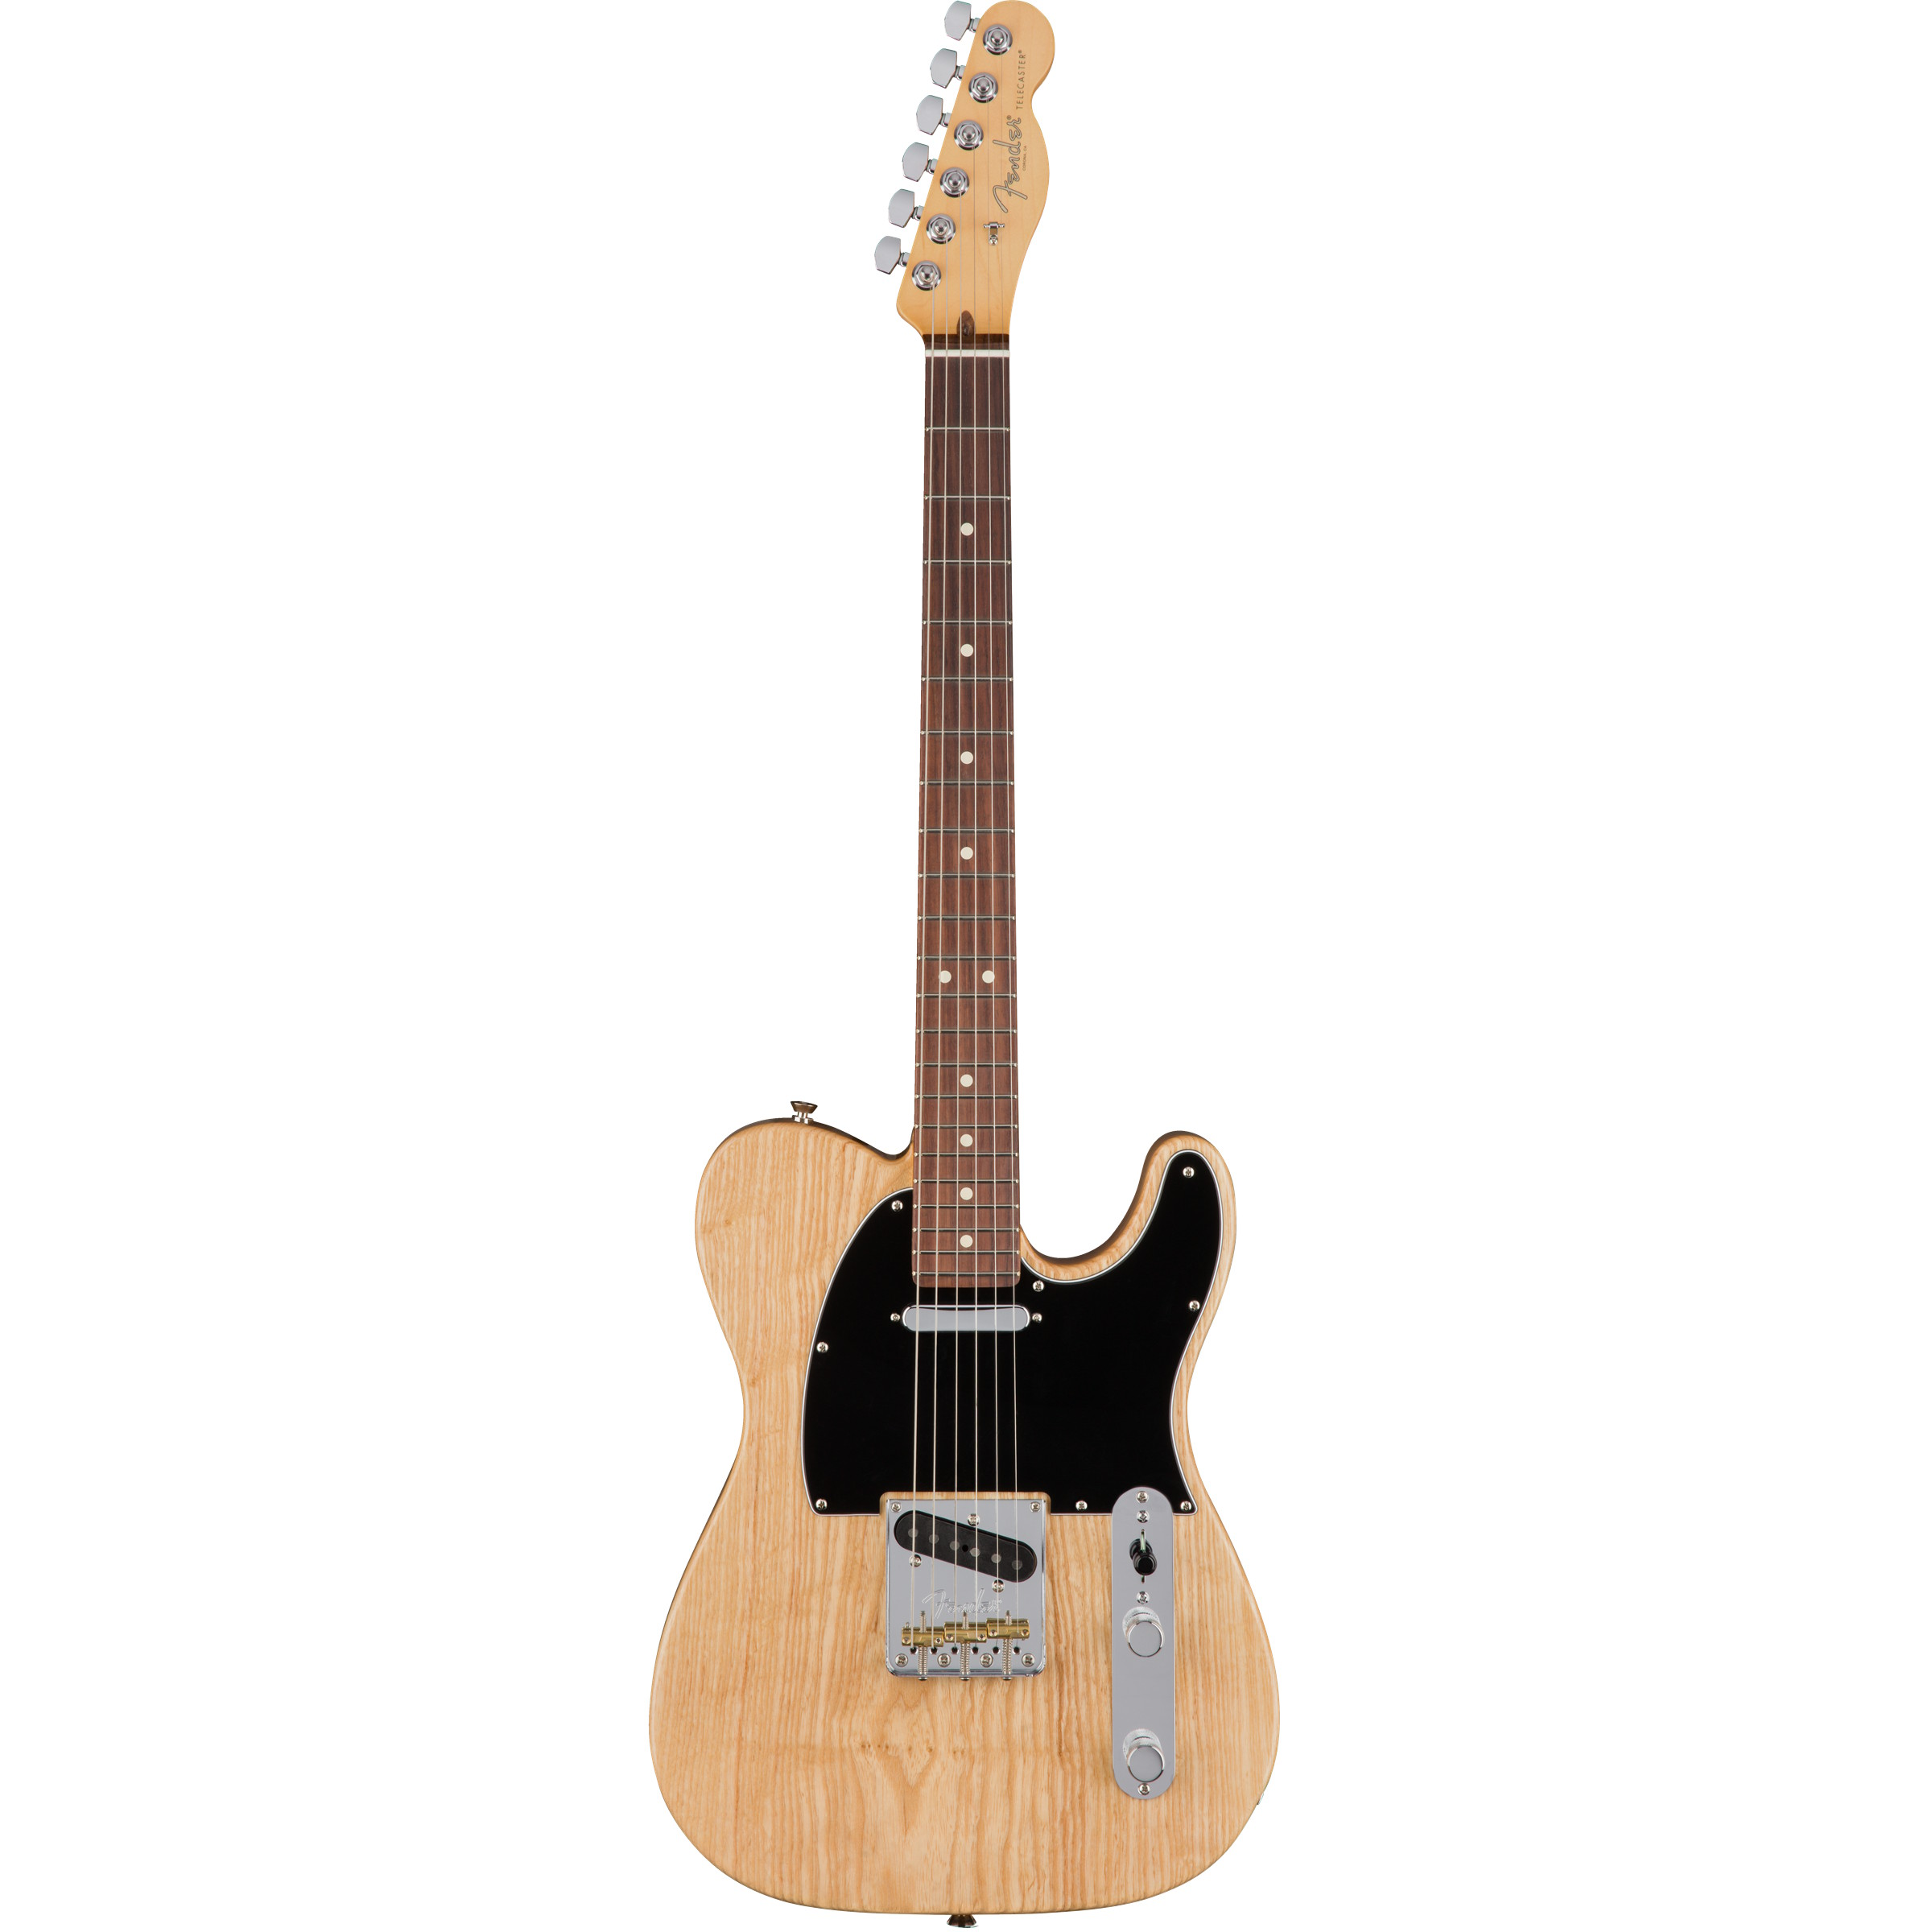 Fender American Pro Tele RW natural